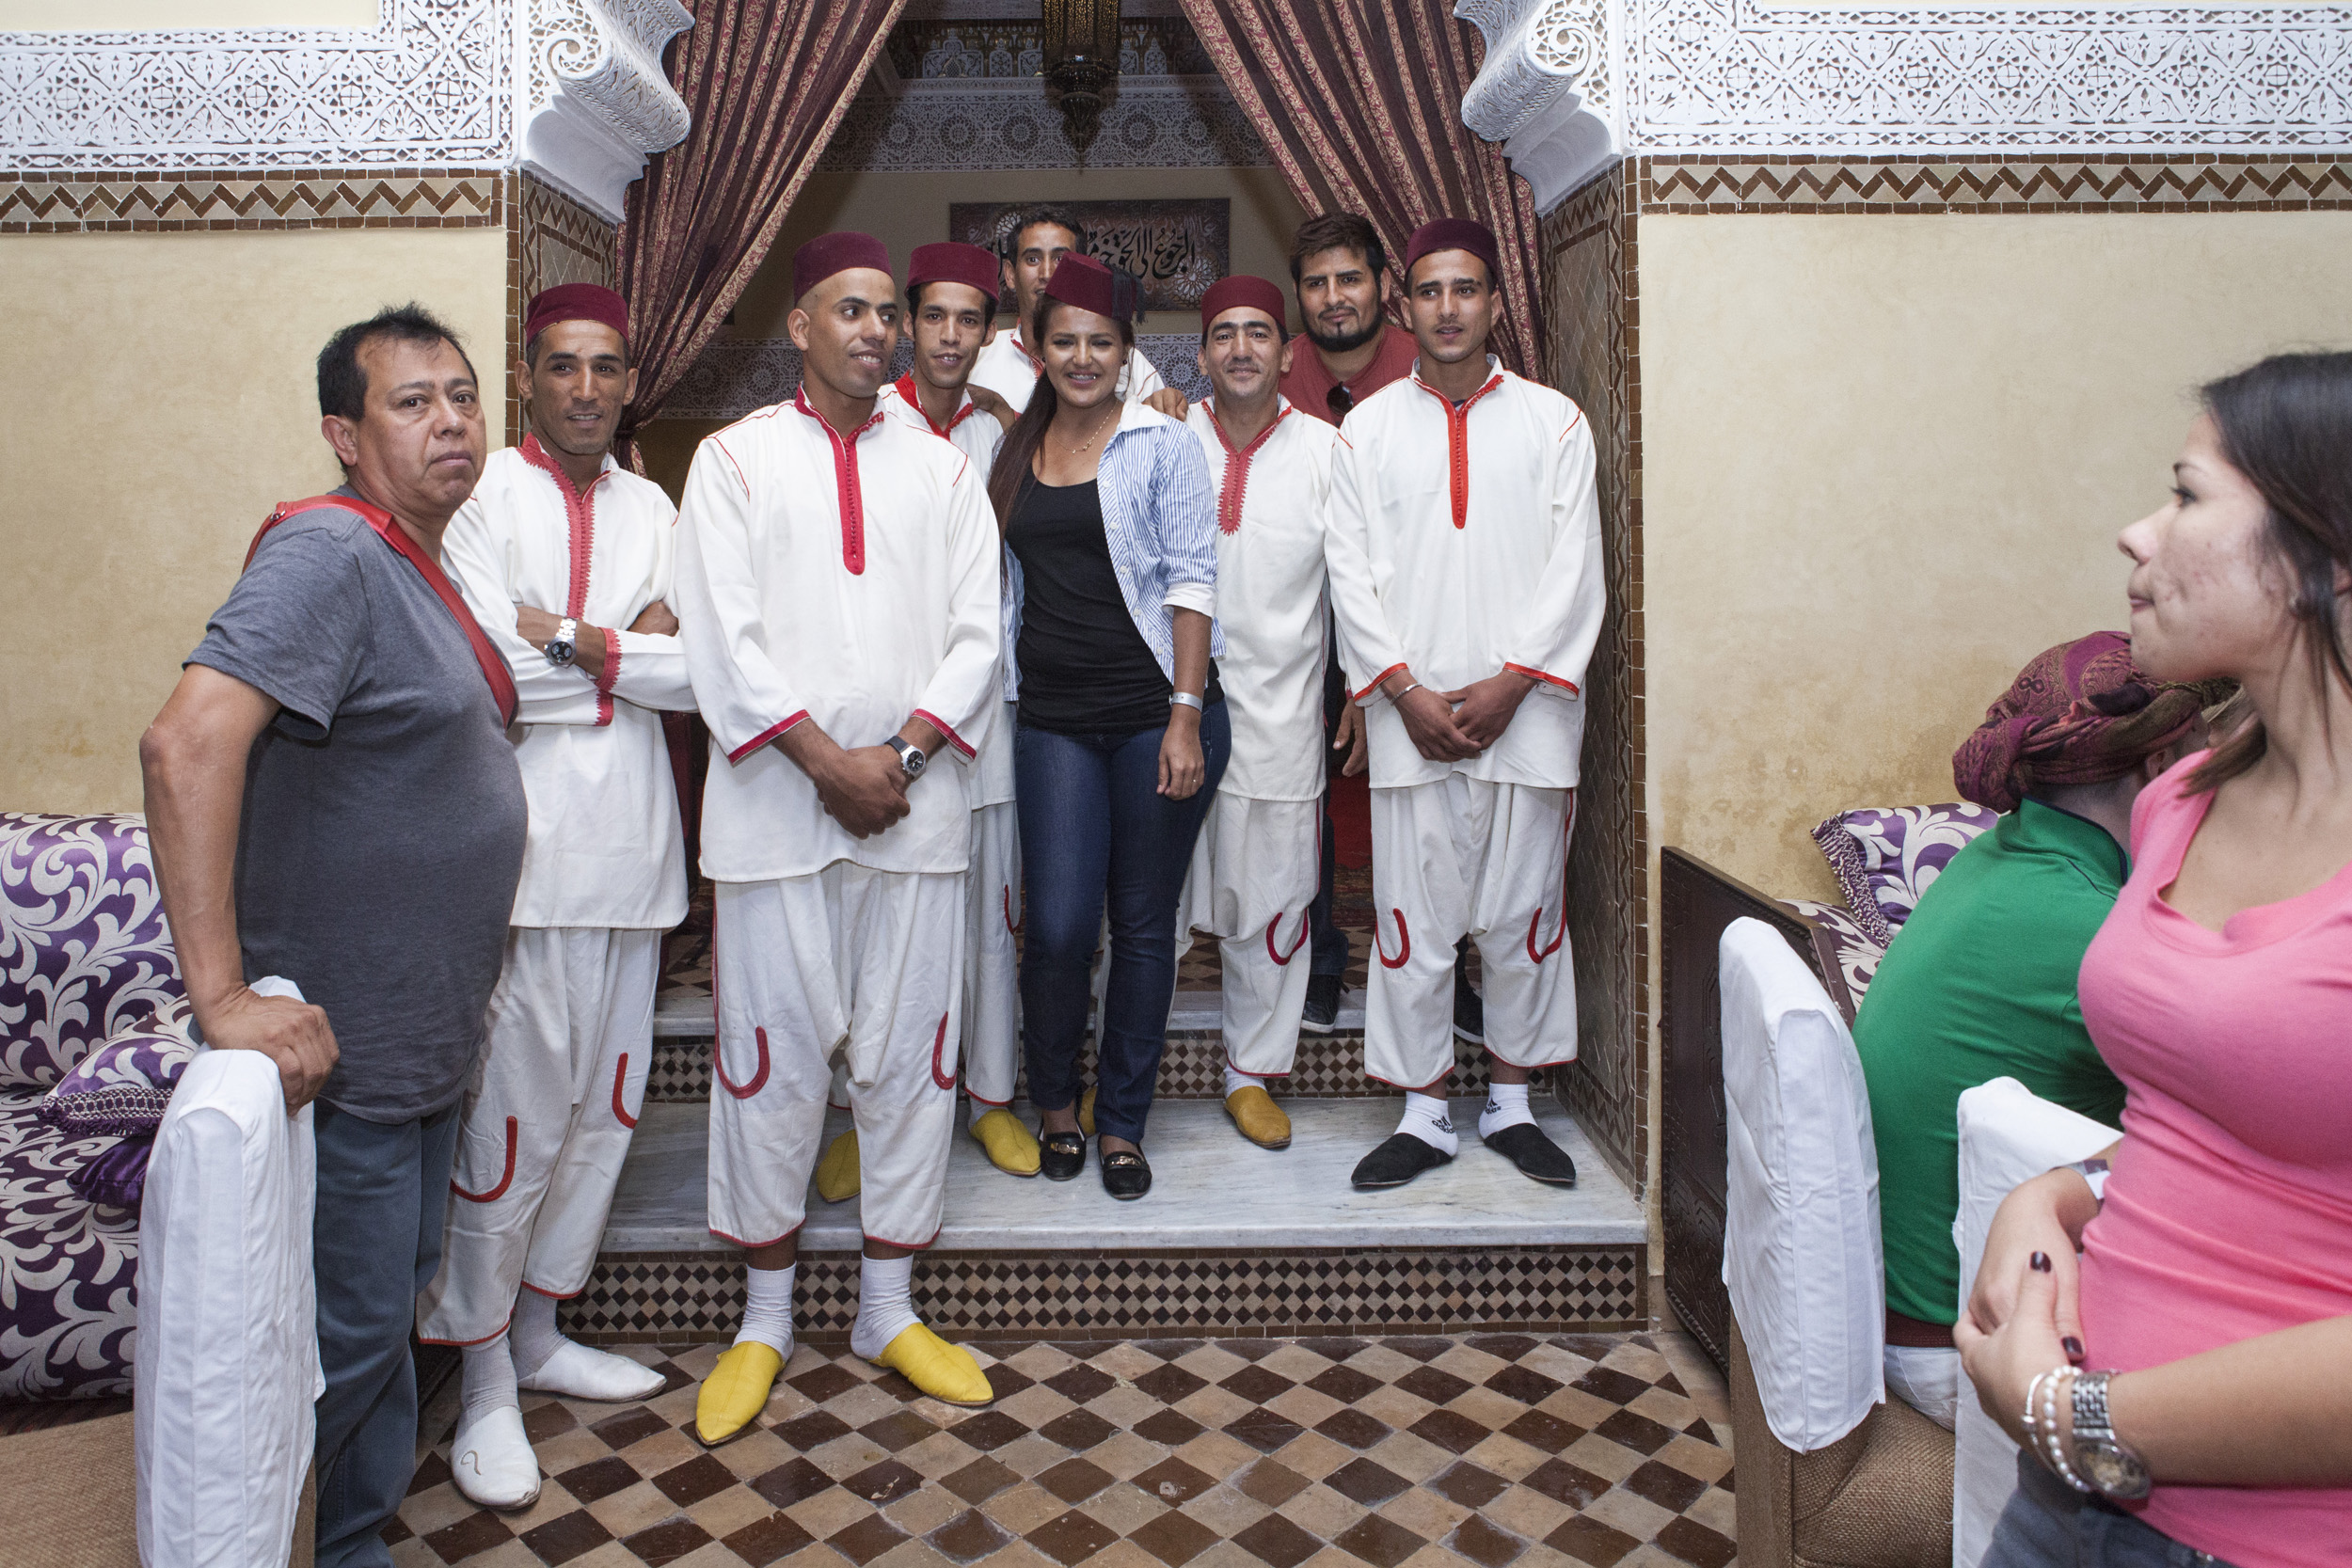 marrakech_2_convencion_anual_salerm_cosmetics_proline_13